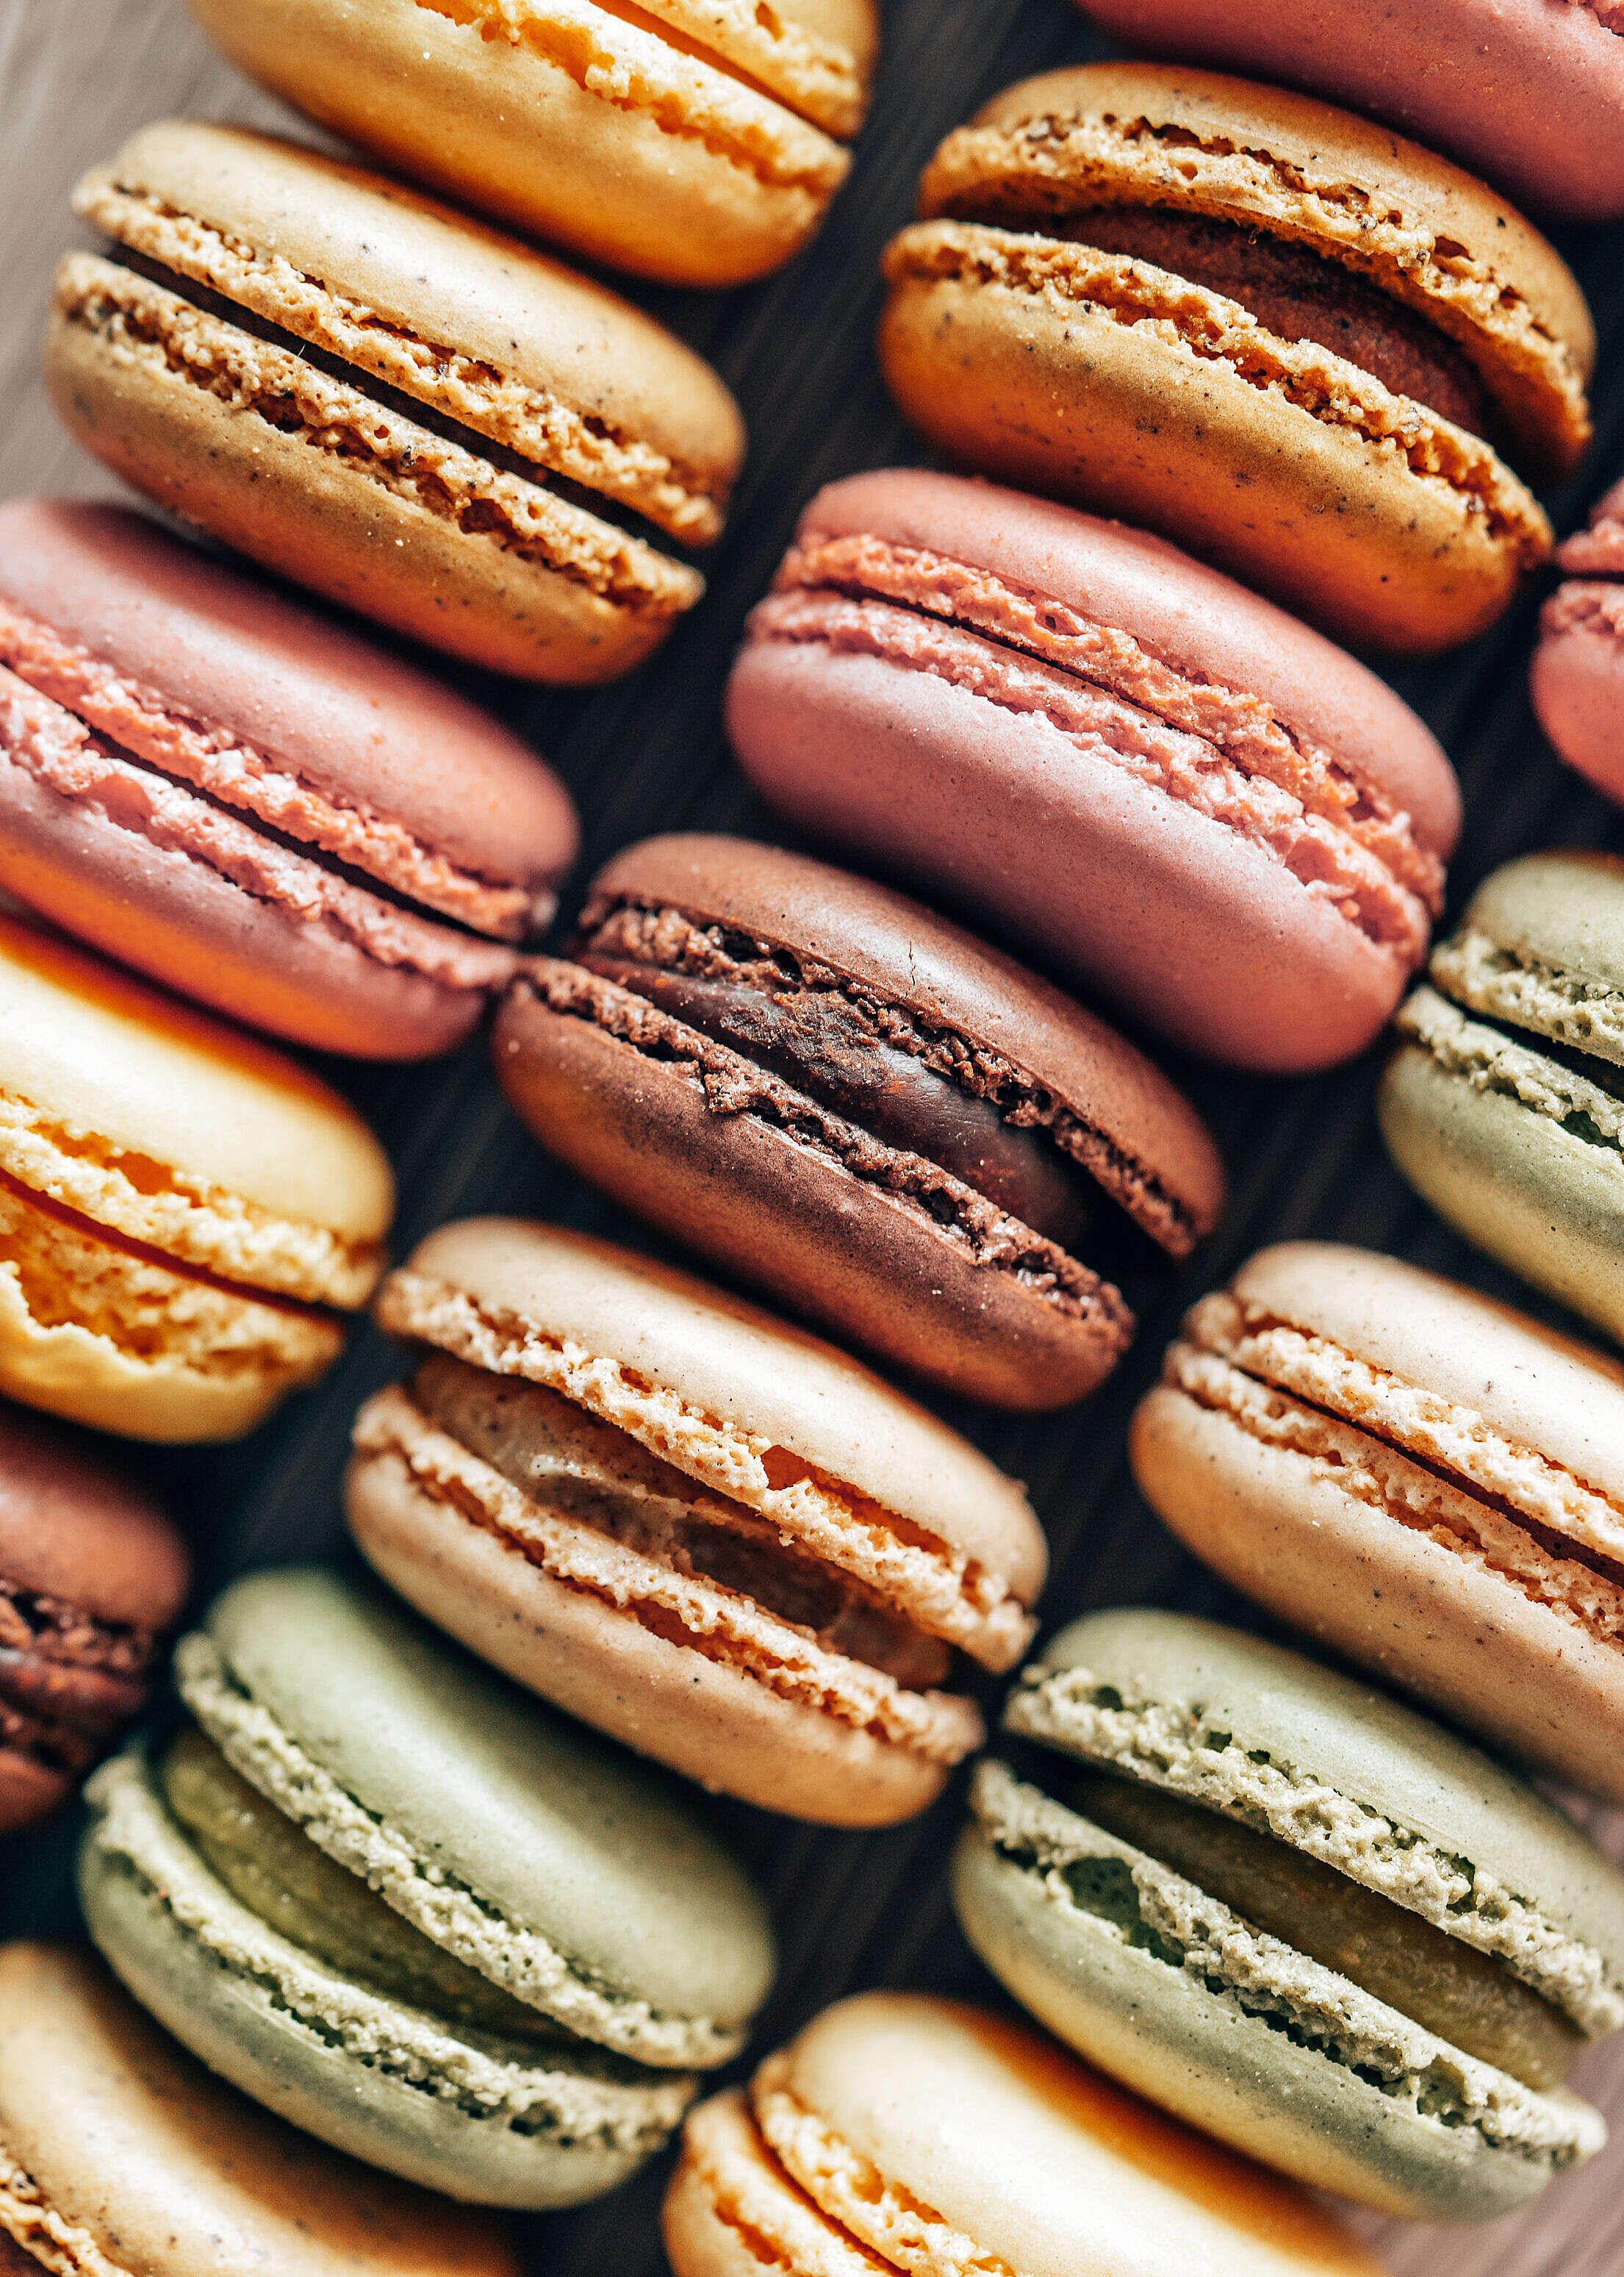 Macarons Vertical Free Stock Photo